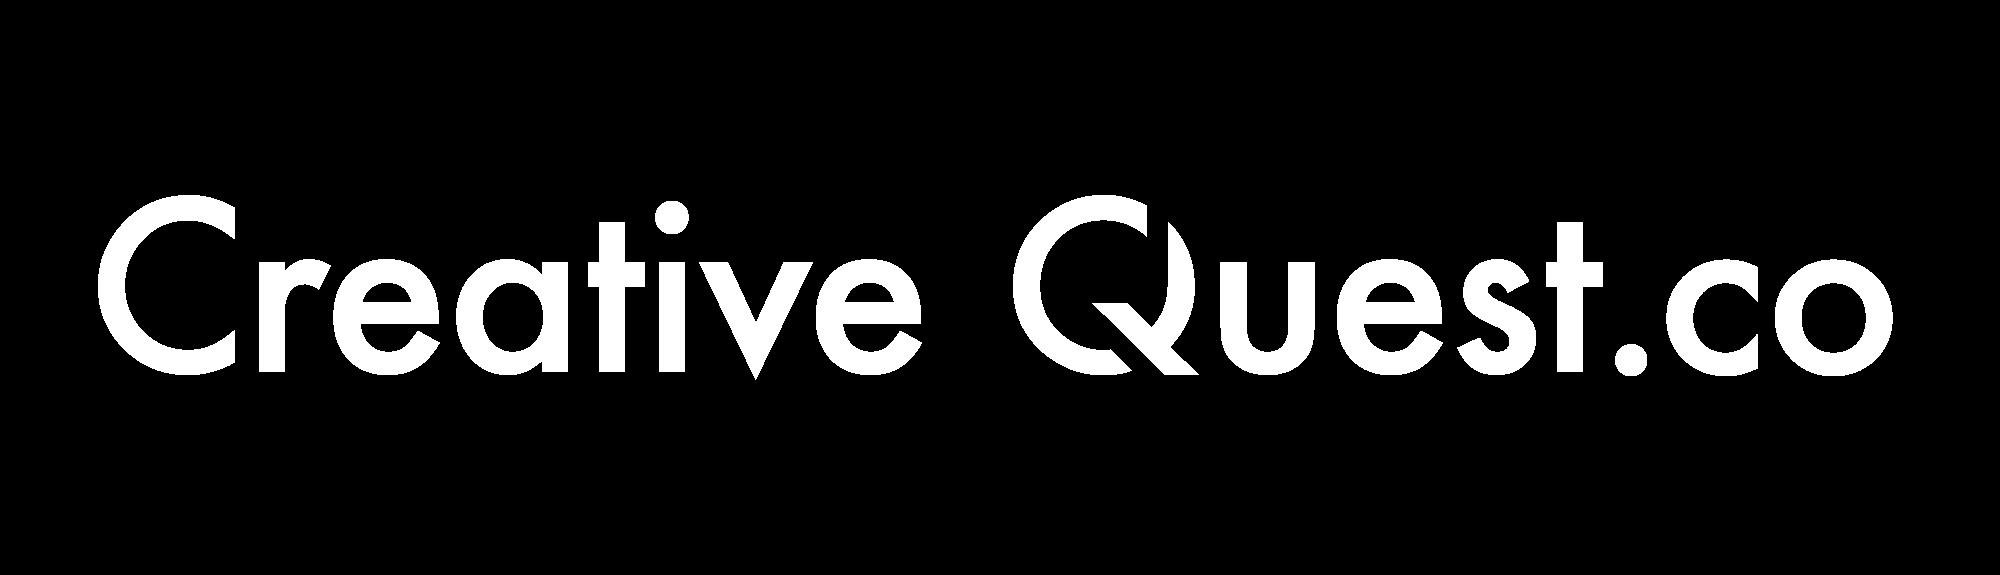 Creative Quest.co